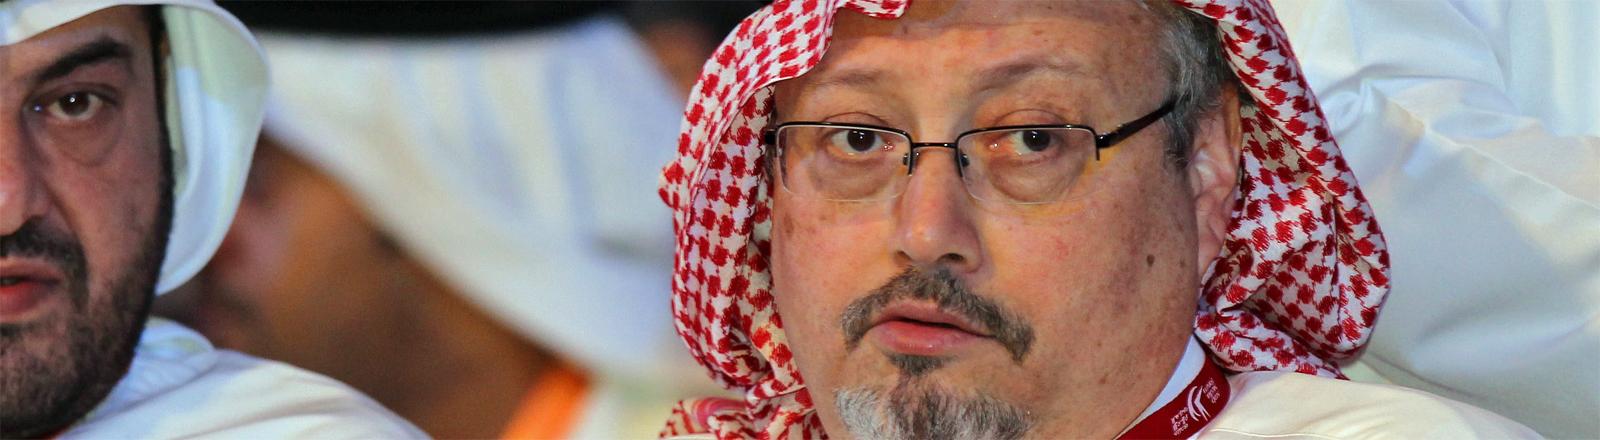 Der saudische Journalist Jamal Khashoggi beim Arab Media Forum 2012 in Dubai